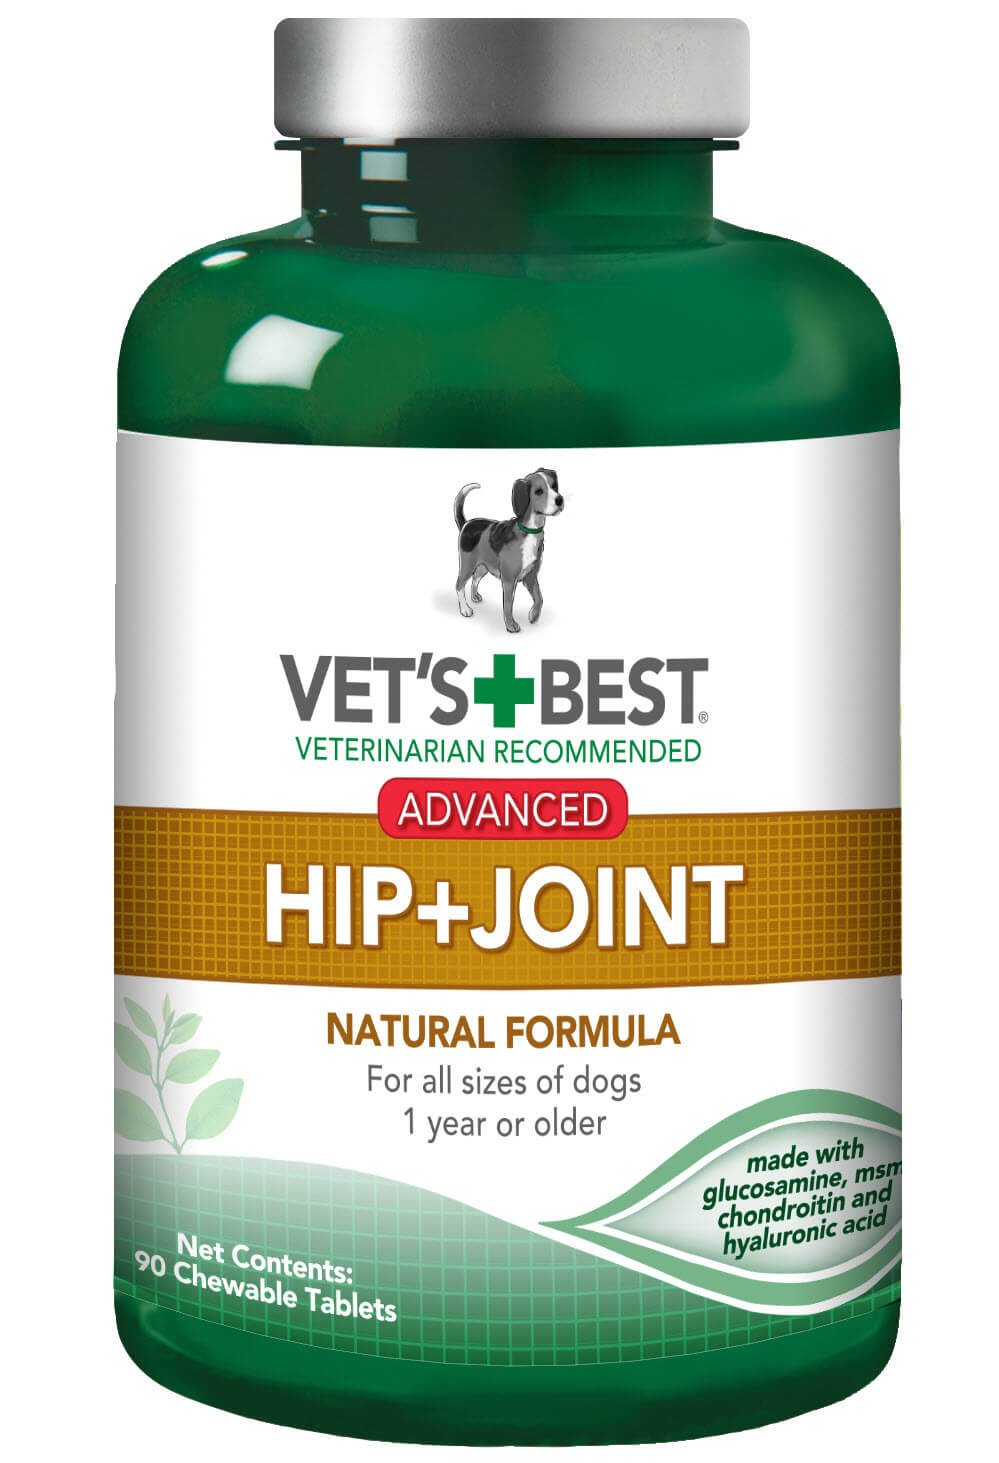 Vet's Best Advanced Hip & Joint Dog Supplements, 90 Chewable Tablets